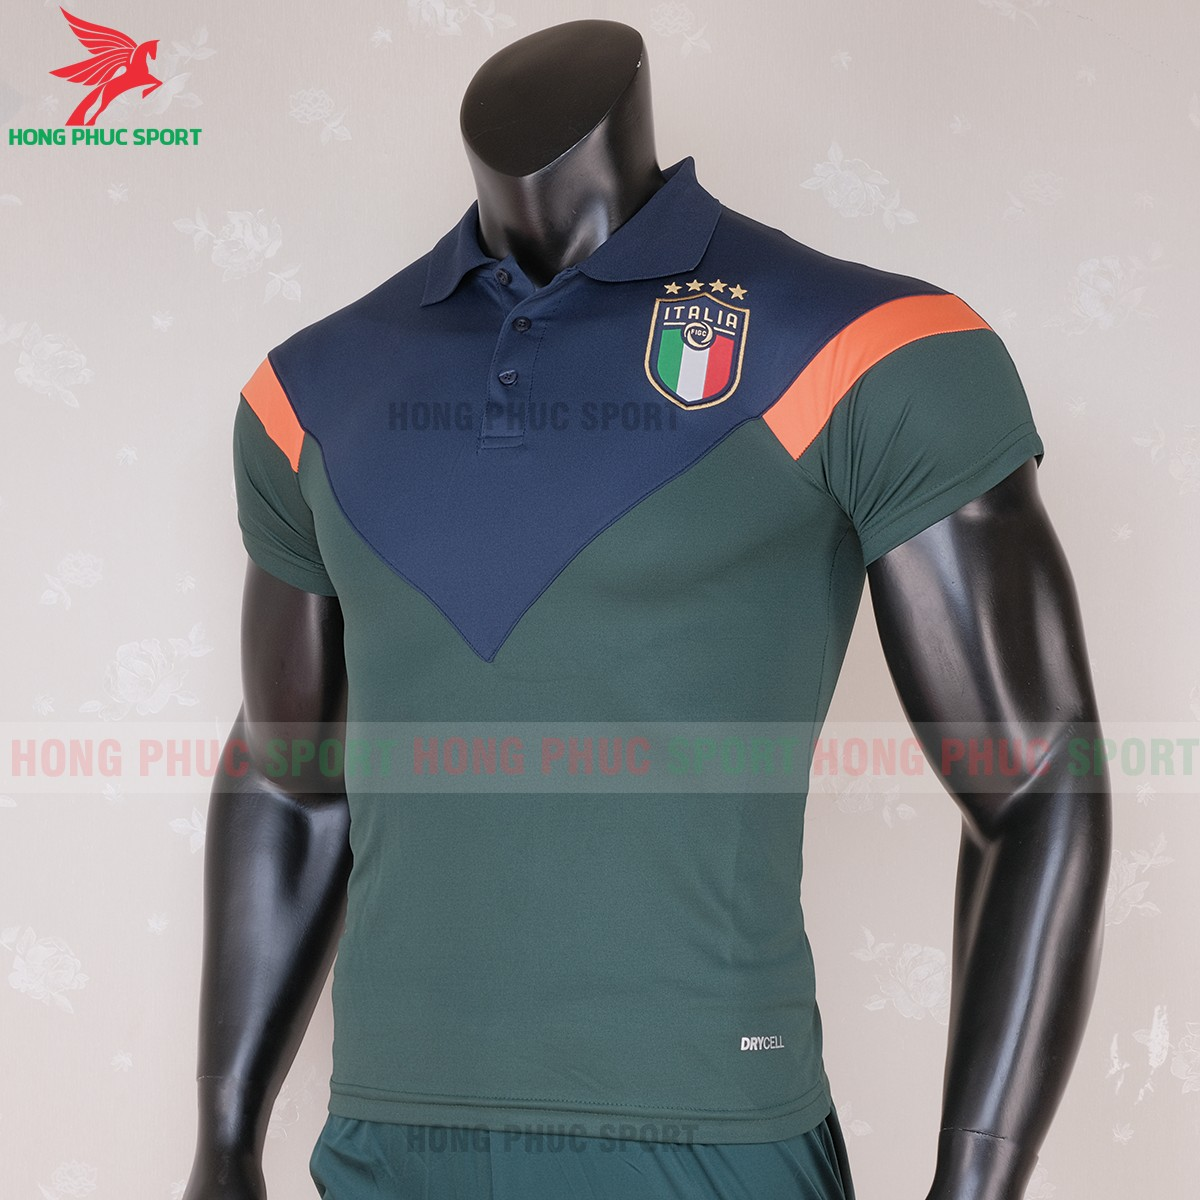 https://cdn.hongphucsport.com/unsafe/s4.shopbay.vn/files/285/ao-polo-tuyen-italia-2020-4-5f73e3b708dc2.png